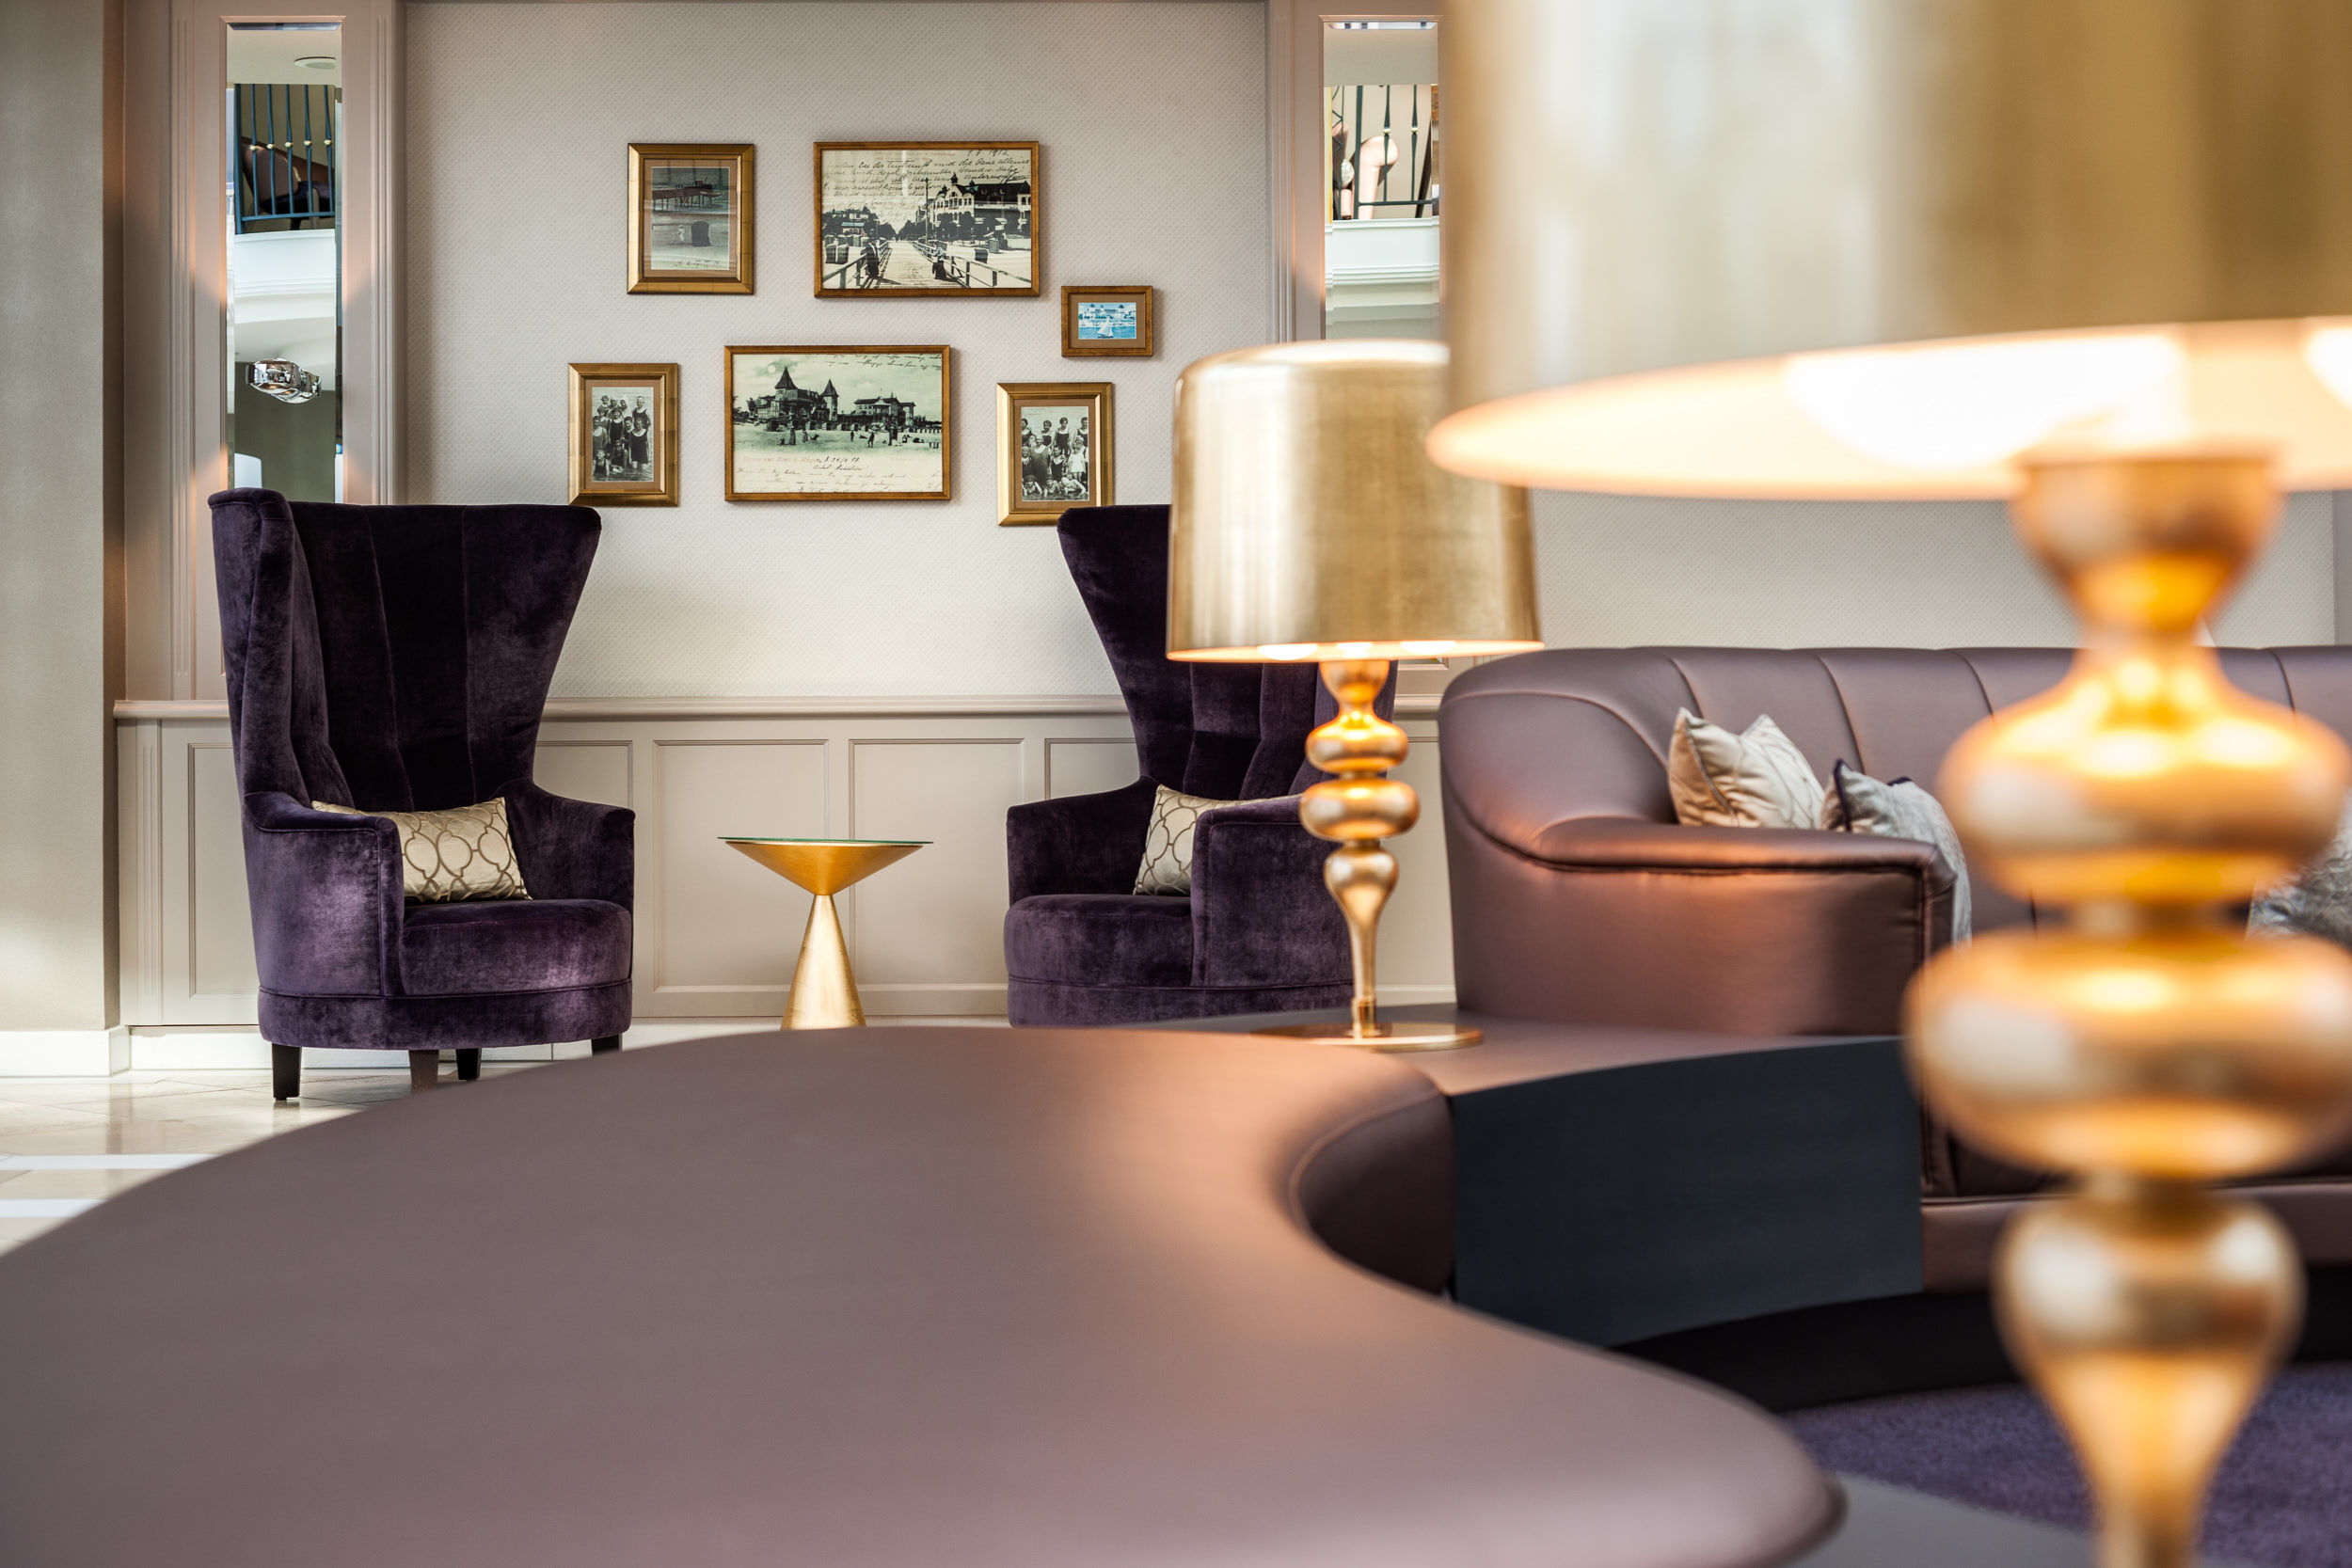 Hotelfotografie-Foto-Burwitz-Pocha 8